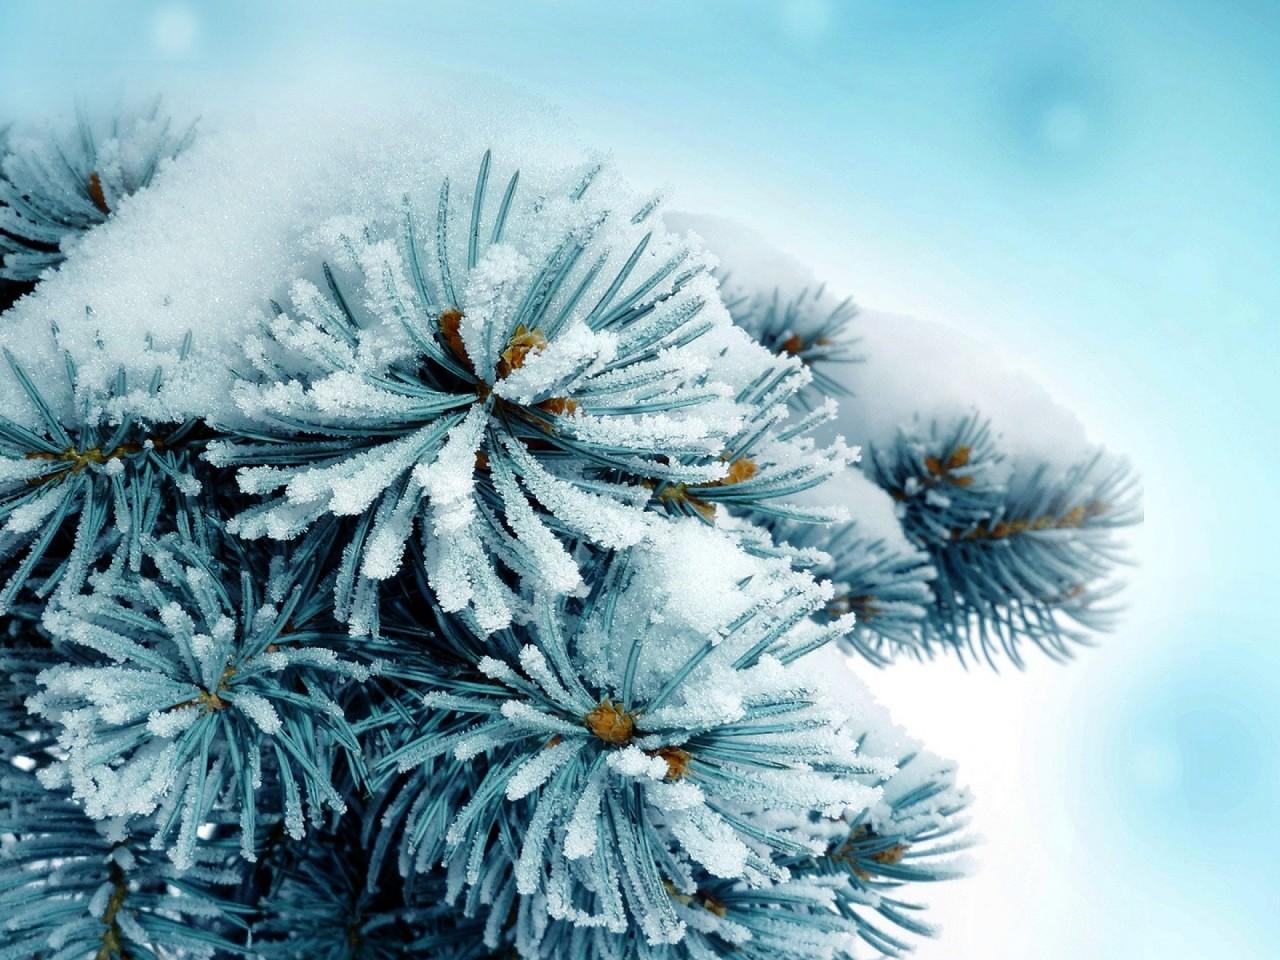 1280x800 снег, сосна, зима, Природа обои на рабочий стол 13530